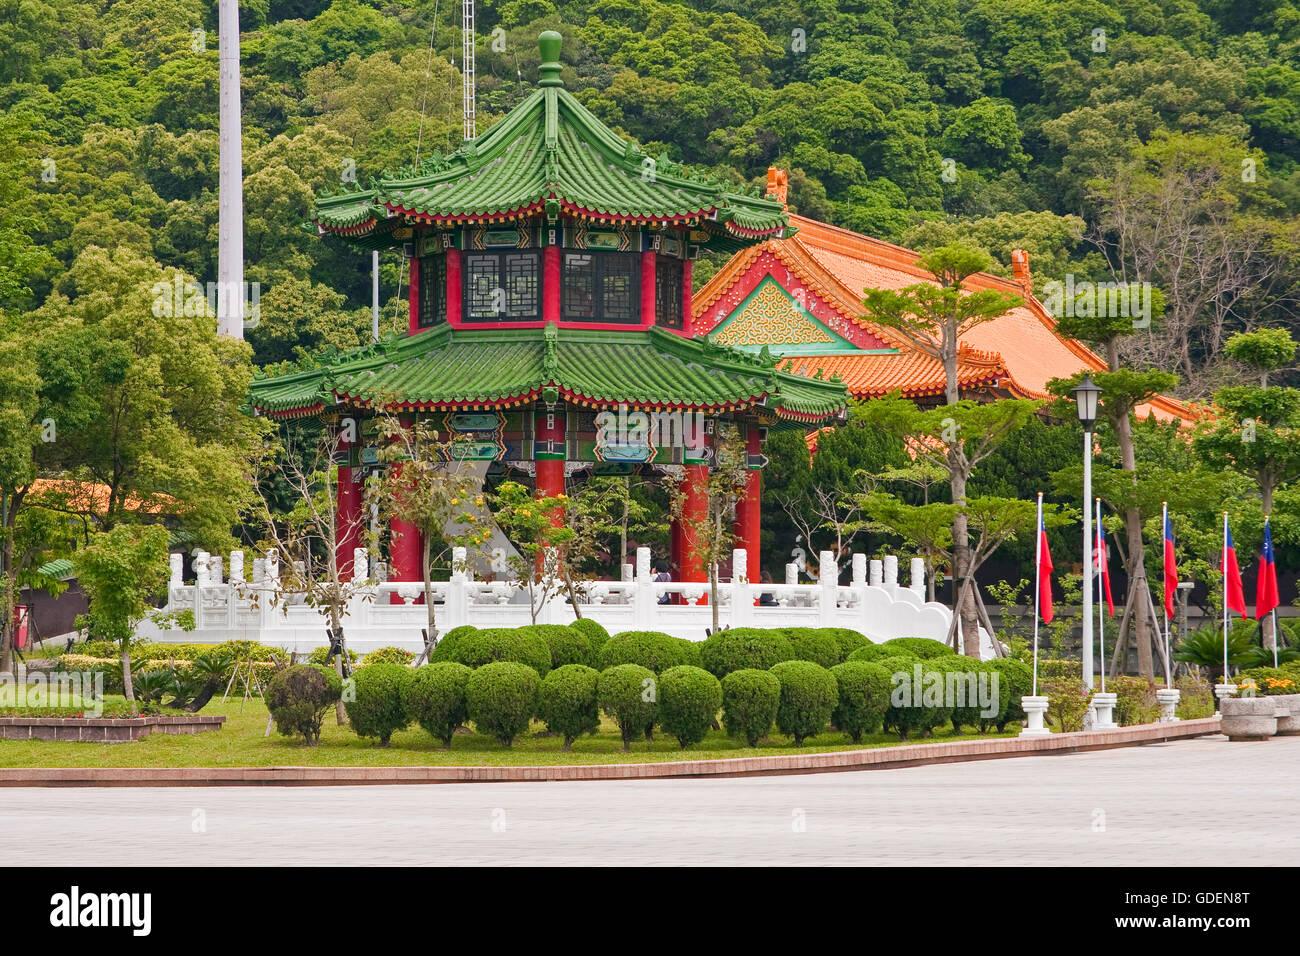 Pagoda at memorial monument, Taipeh, Taiwan - Stock Image